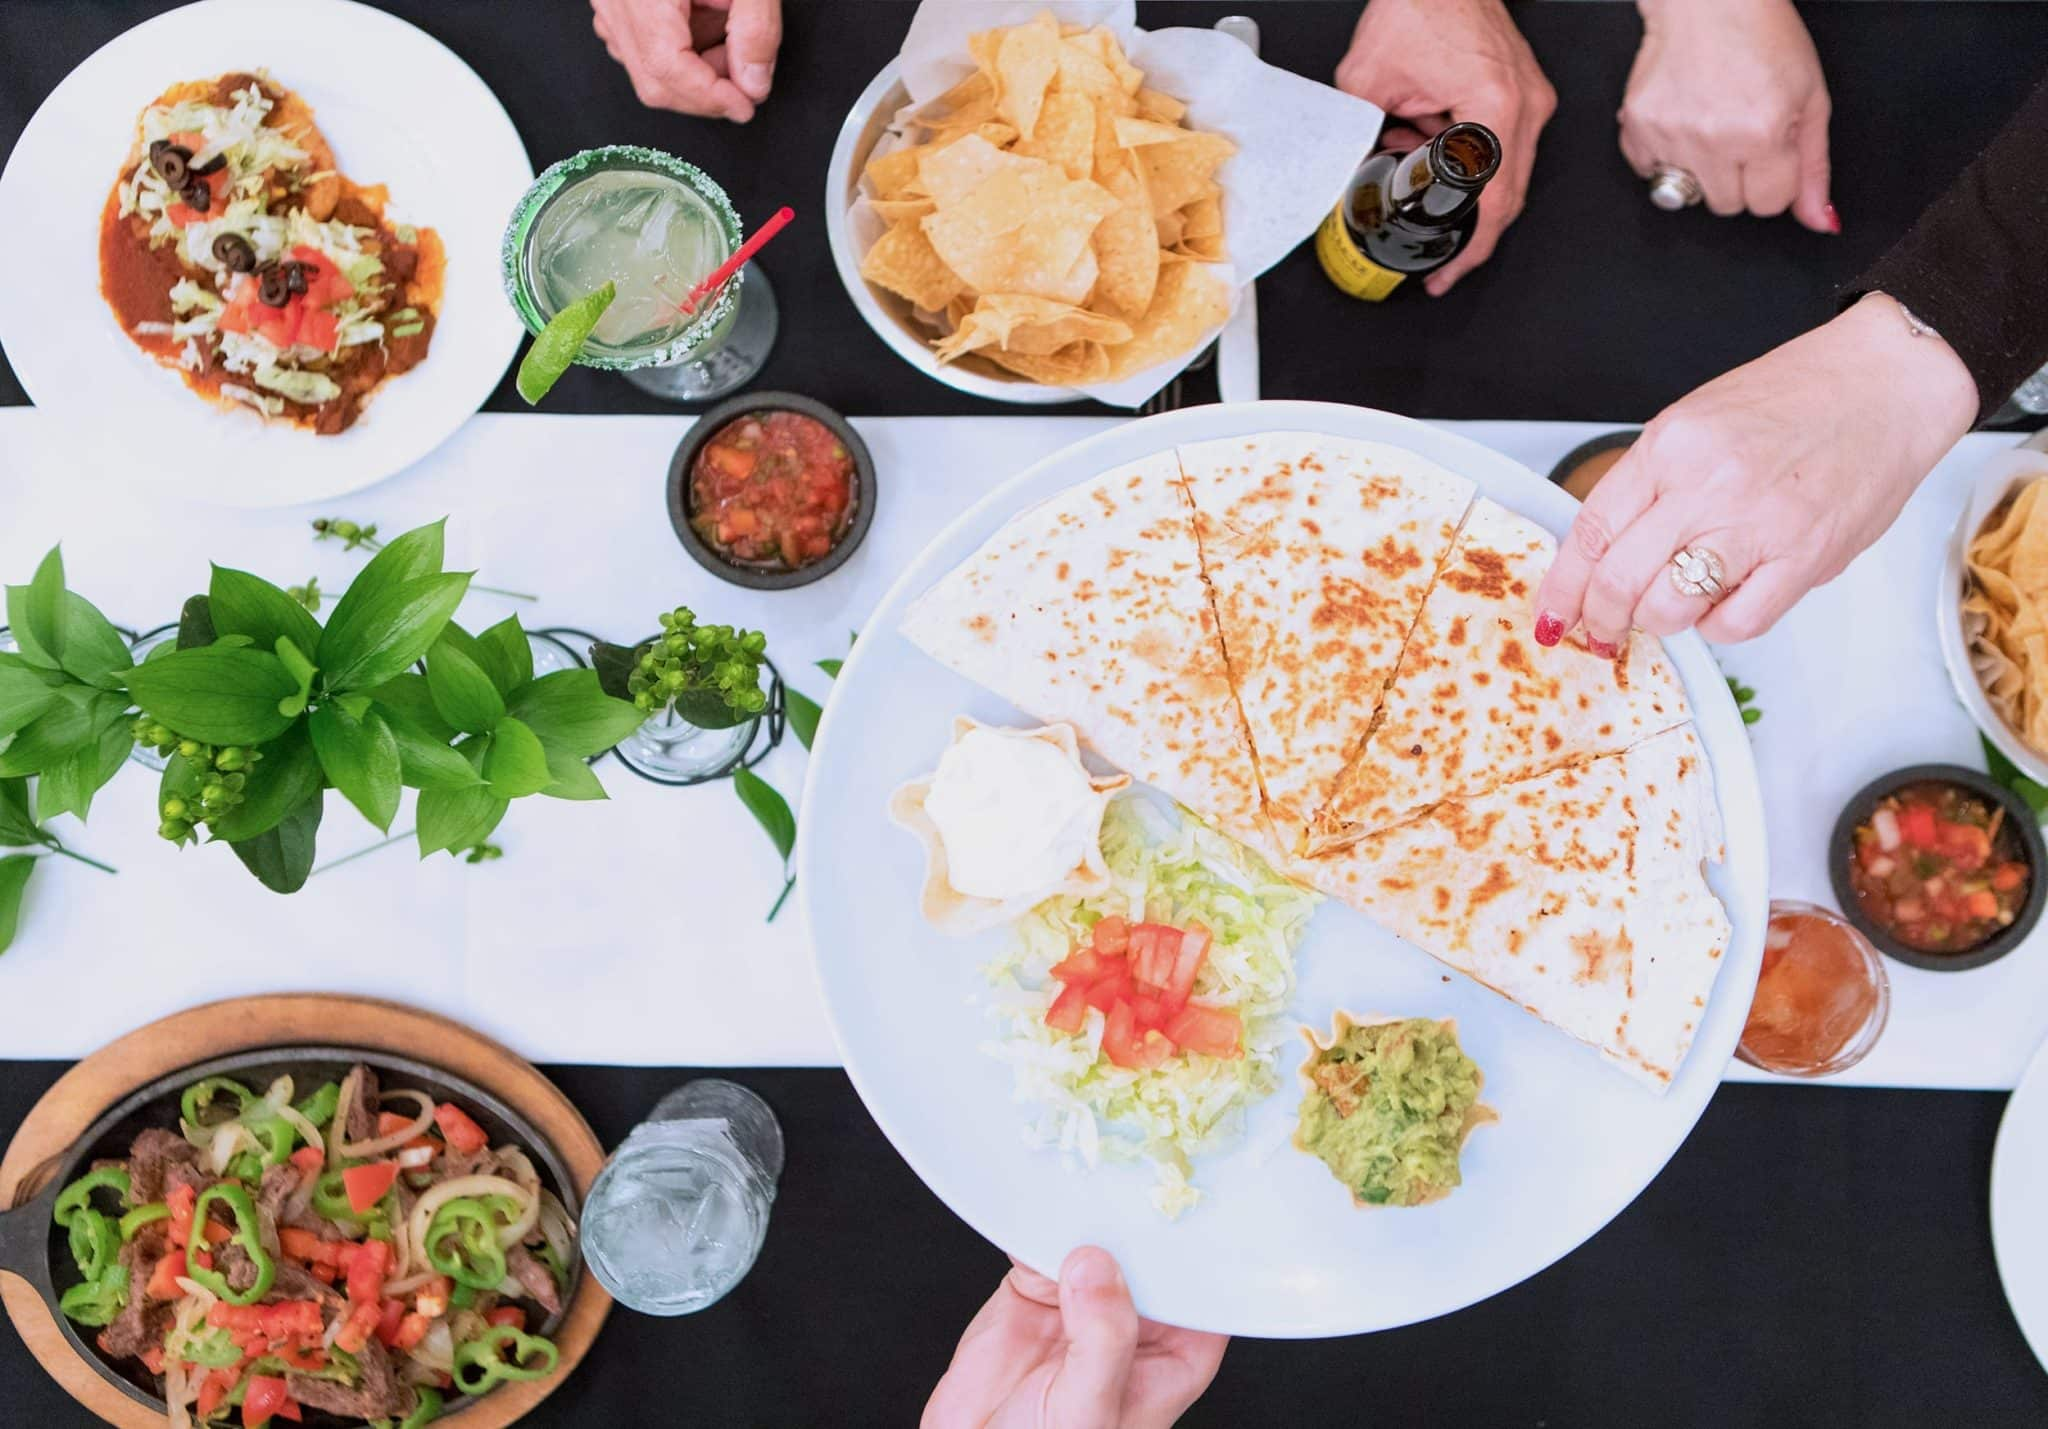 Serranos Mexican Food Restaurants logo